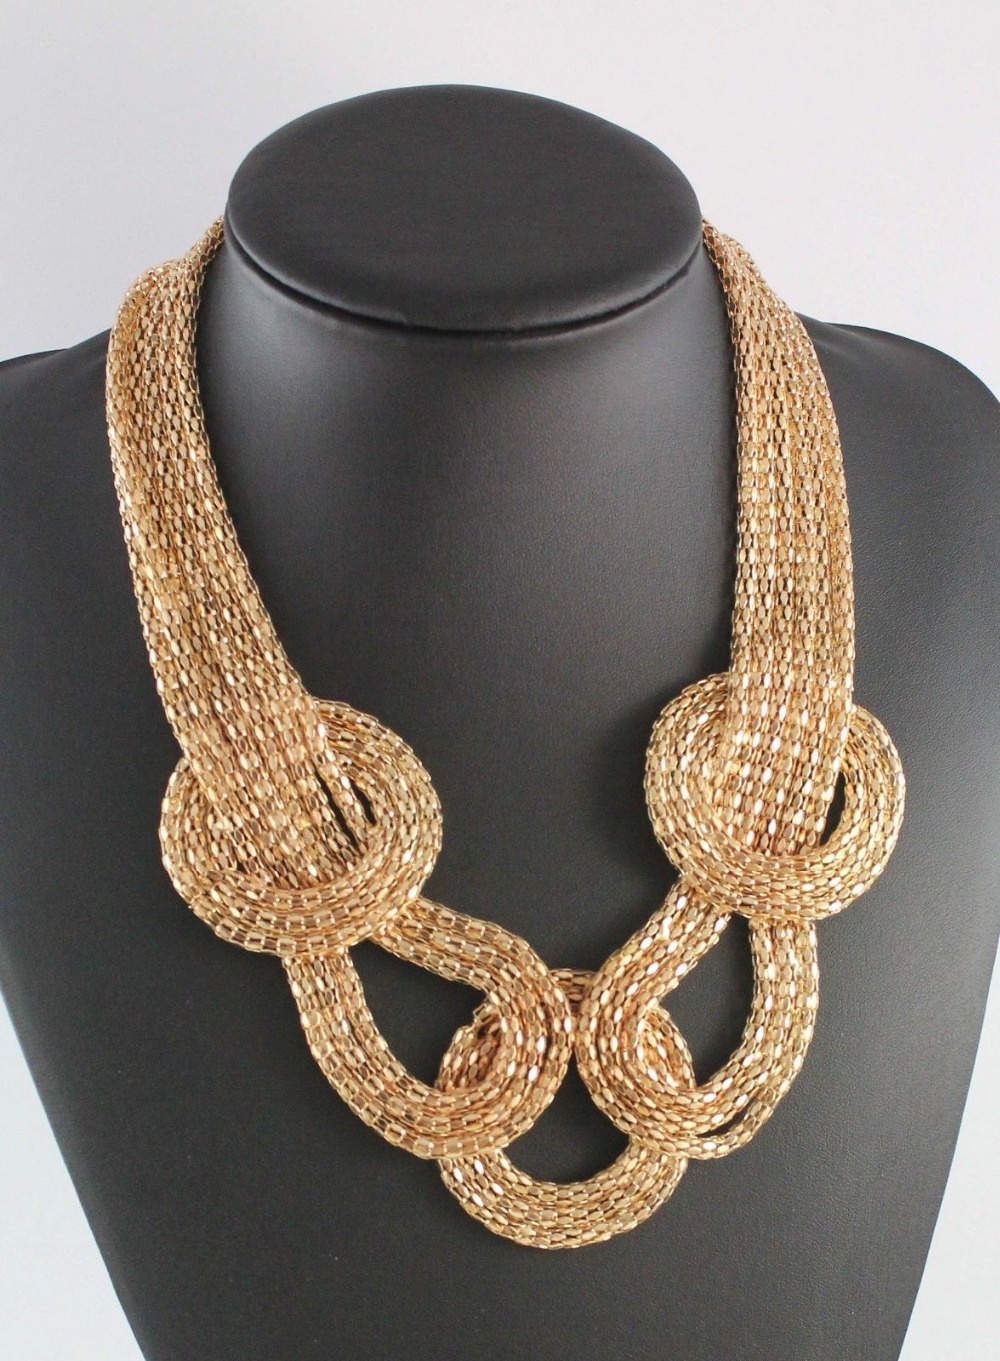 Fashion Women Chunky Golden Twist Knot Mesh Snake Chain Collar Choker Statement Bib Necklace Jewelry Wholesale 6 Pcs <br><br>Aliexpress